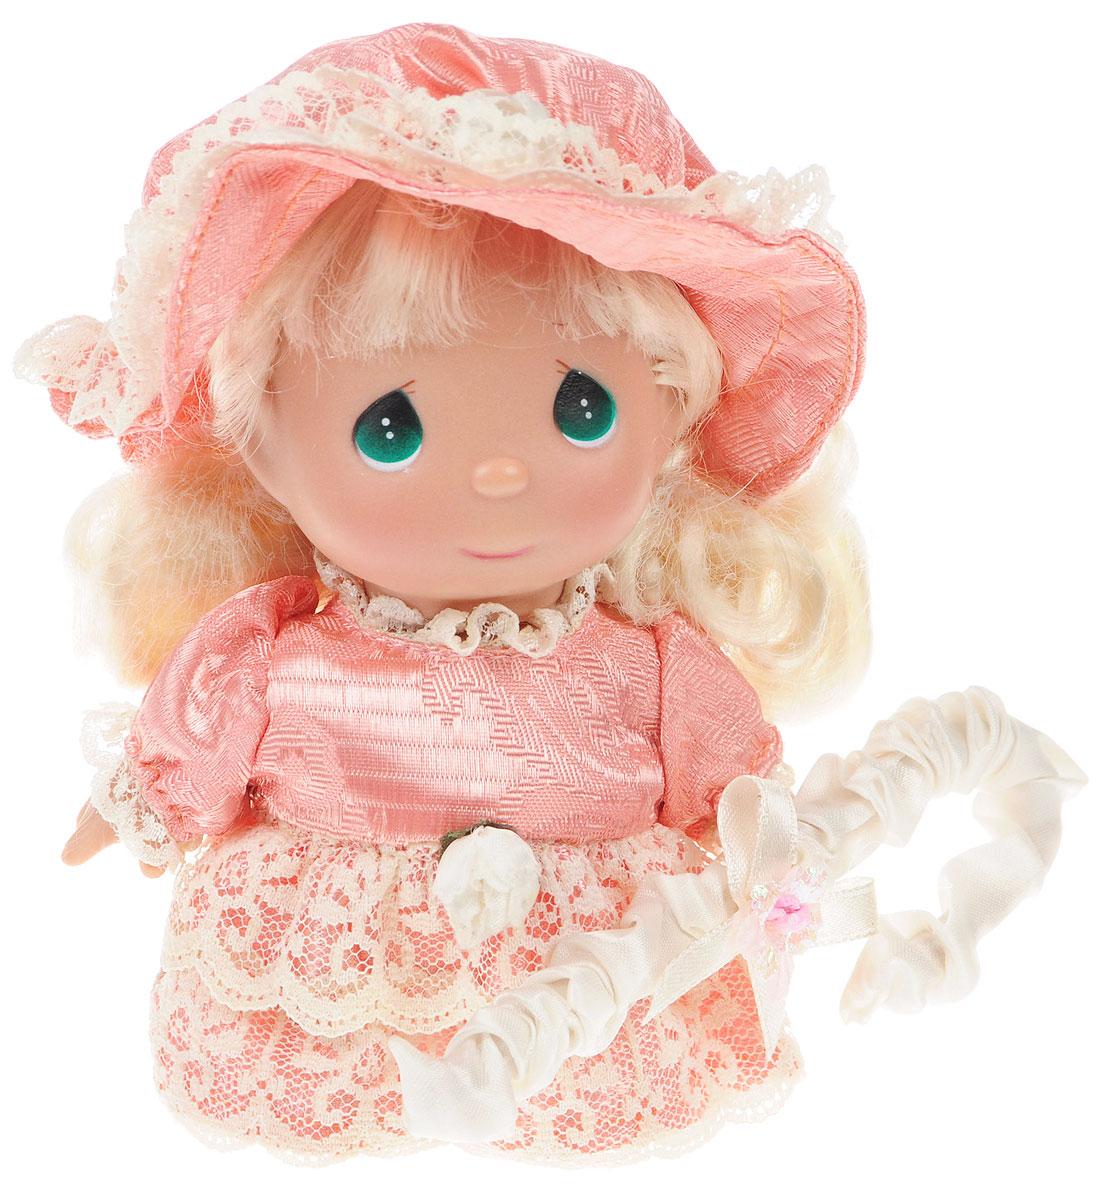 Precious Moments Мини-кукла Пастушка цвет платья светло-коралловый precious moments мини кукла пастушка цвет платья светло коралловый